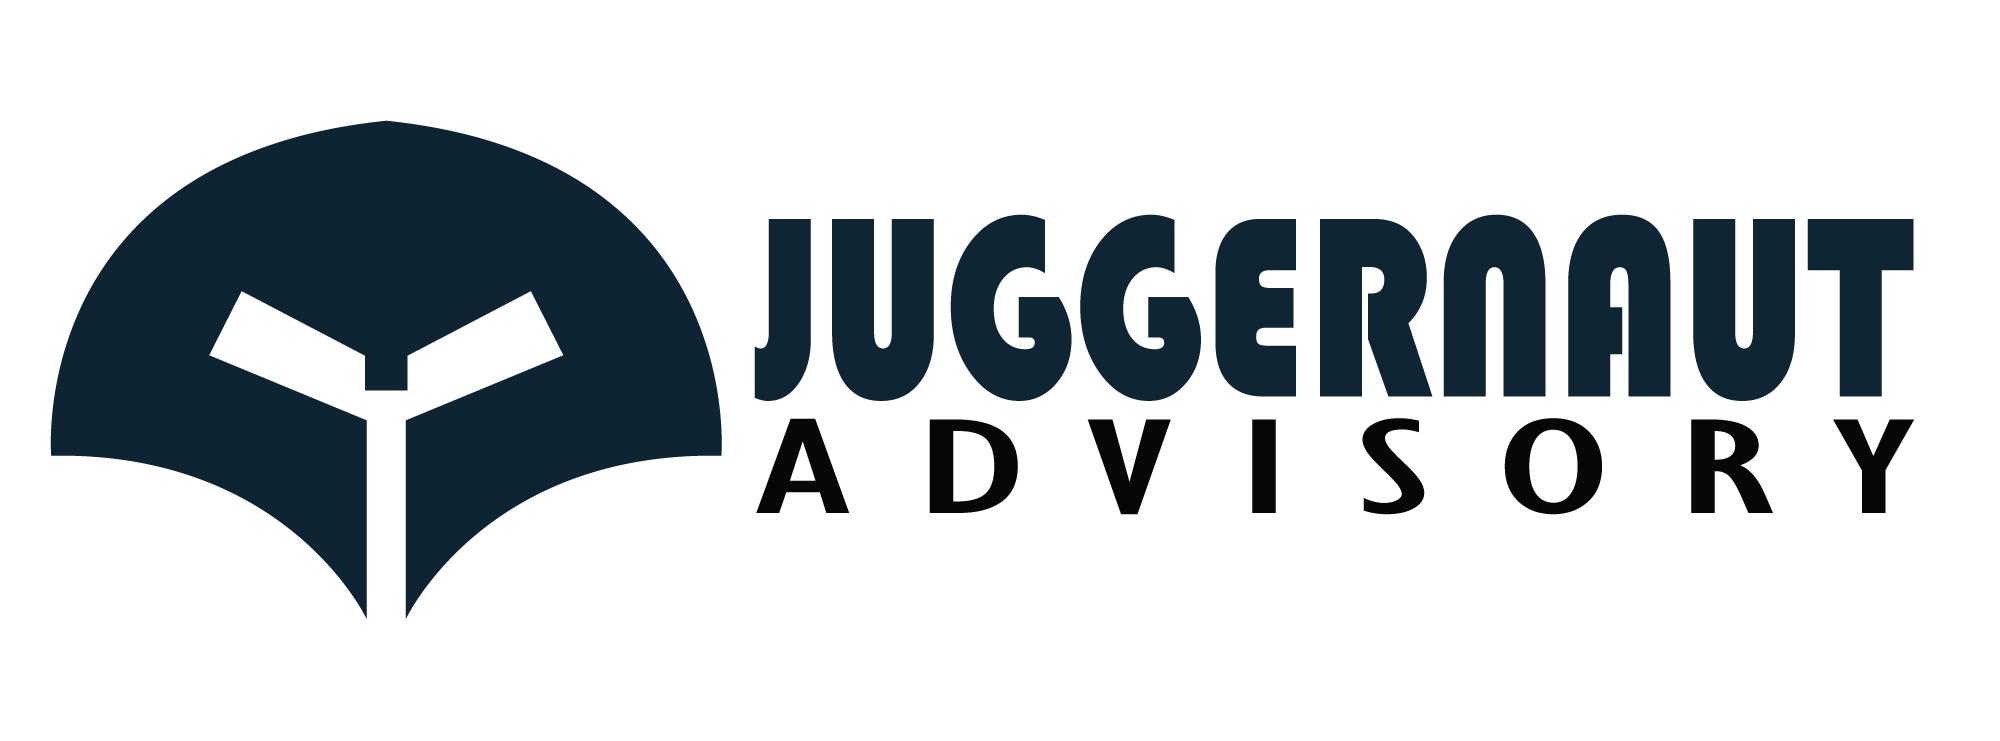 Juggernaut Advisory